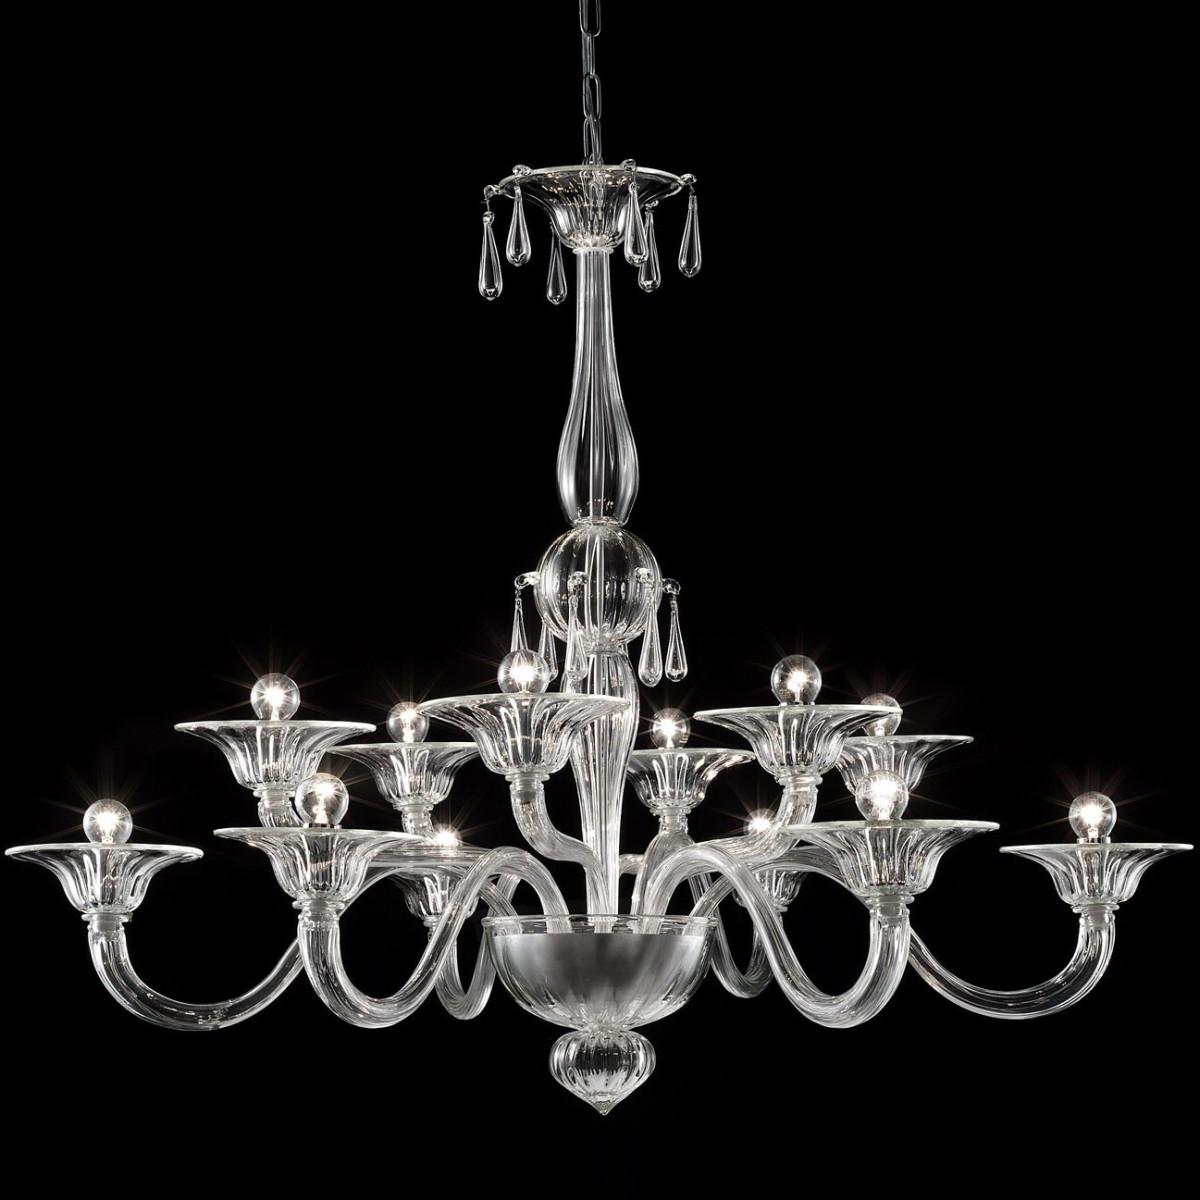 """Gioia"" Murano glas Kronleuchter - 12 flammig, transparent"